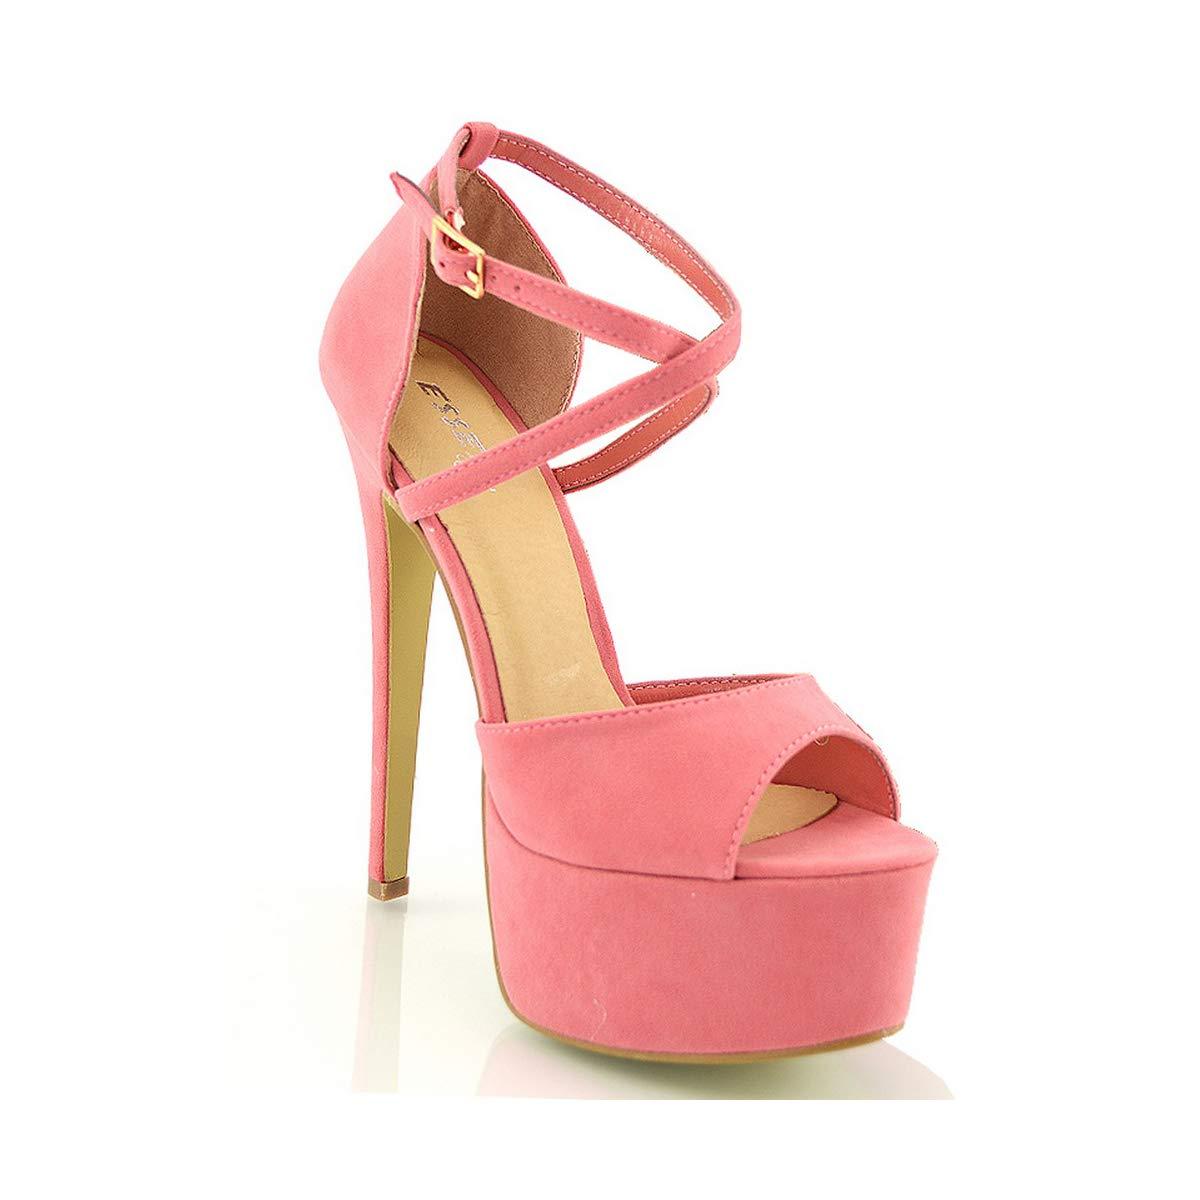 da663d39e8a Womens Platform Strappy Stiletto Ladies High Heel Cross Over Ankle Strap  Sandals Shoes Size 3-8  Amazon.co.uk  Shoes   Bags